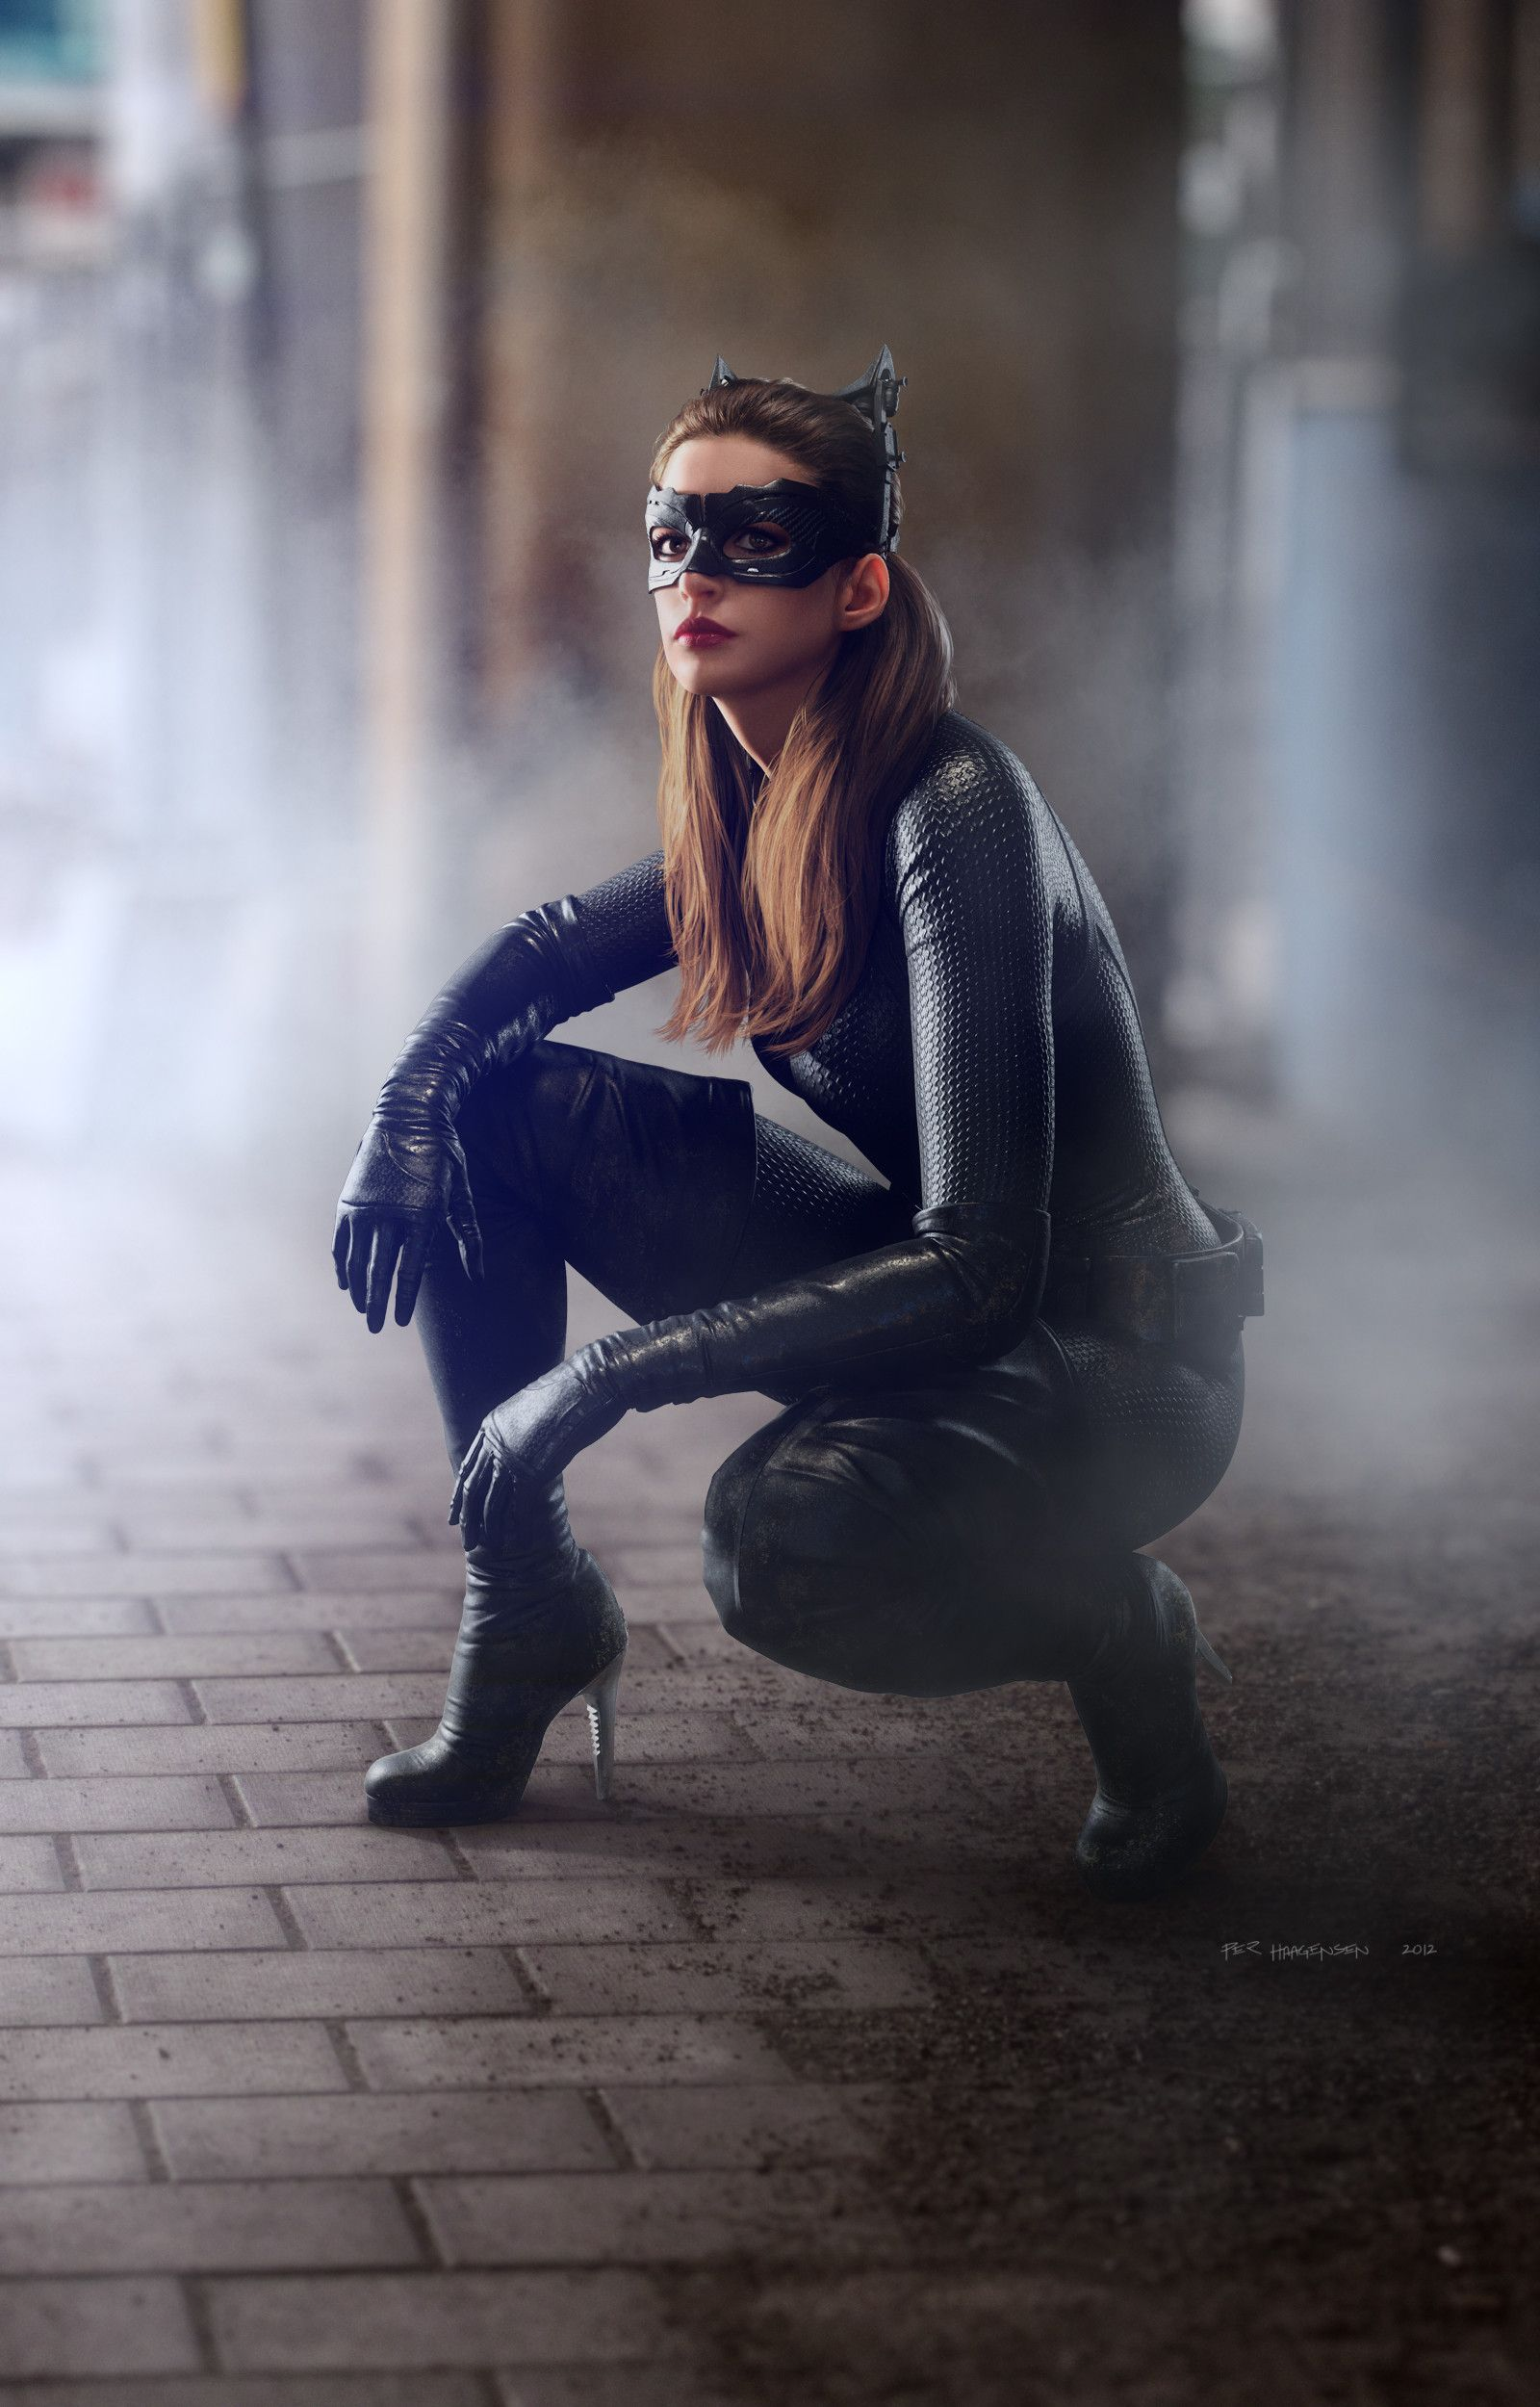 Batman Catwoman Bane Artwork For Christopher Nolan S The Dark